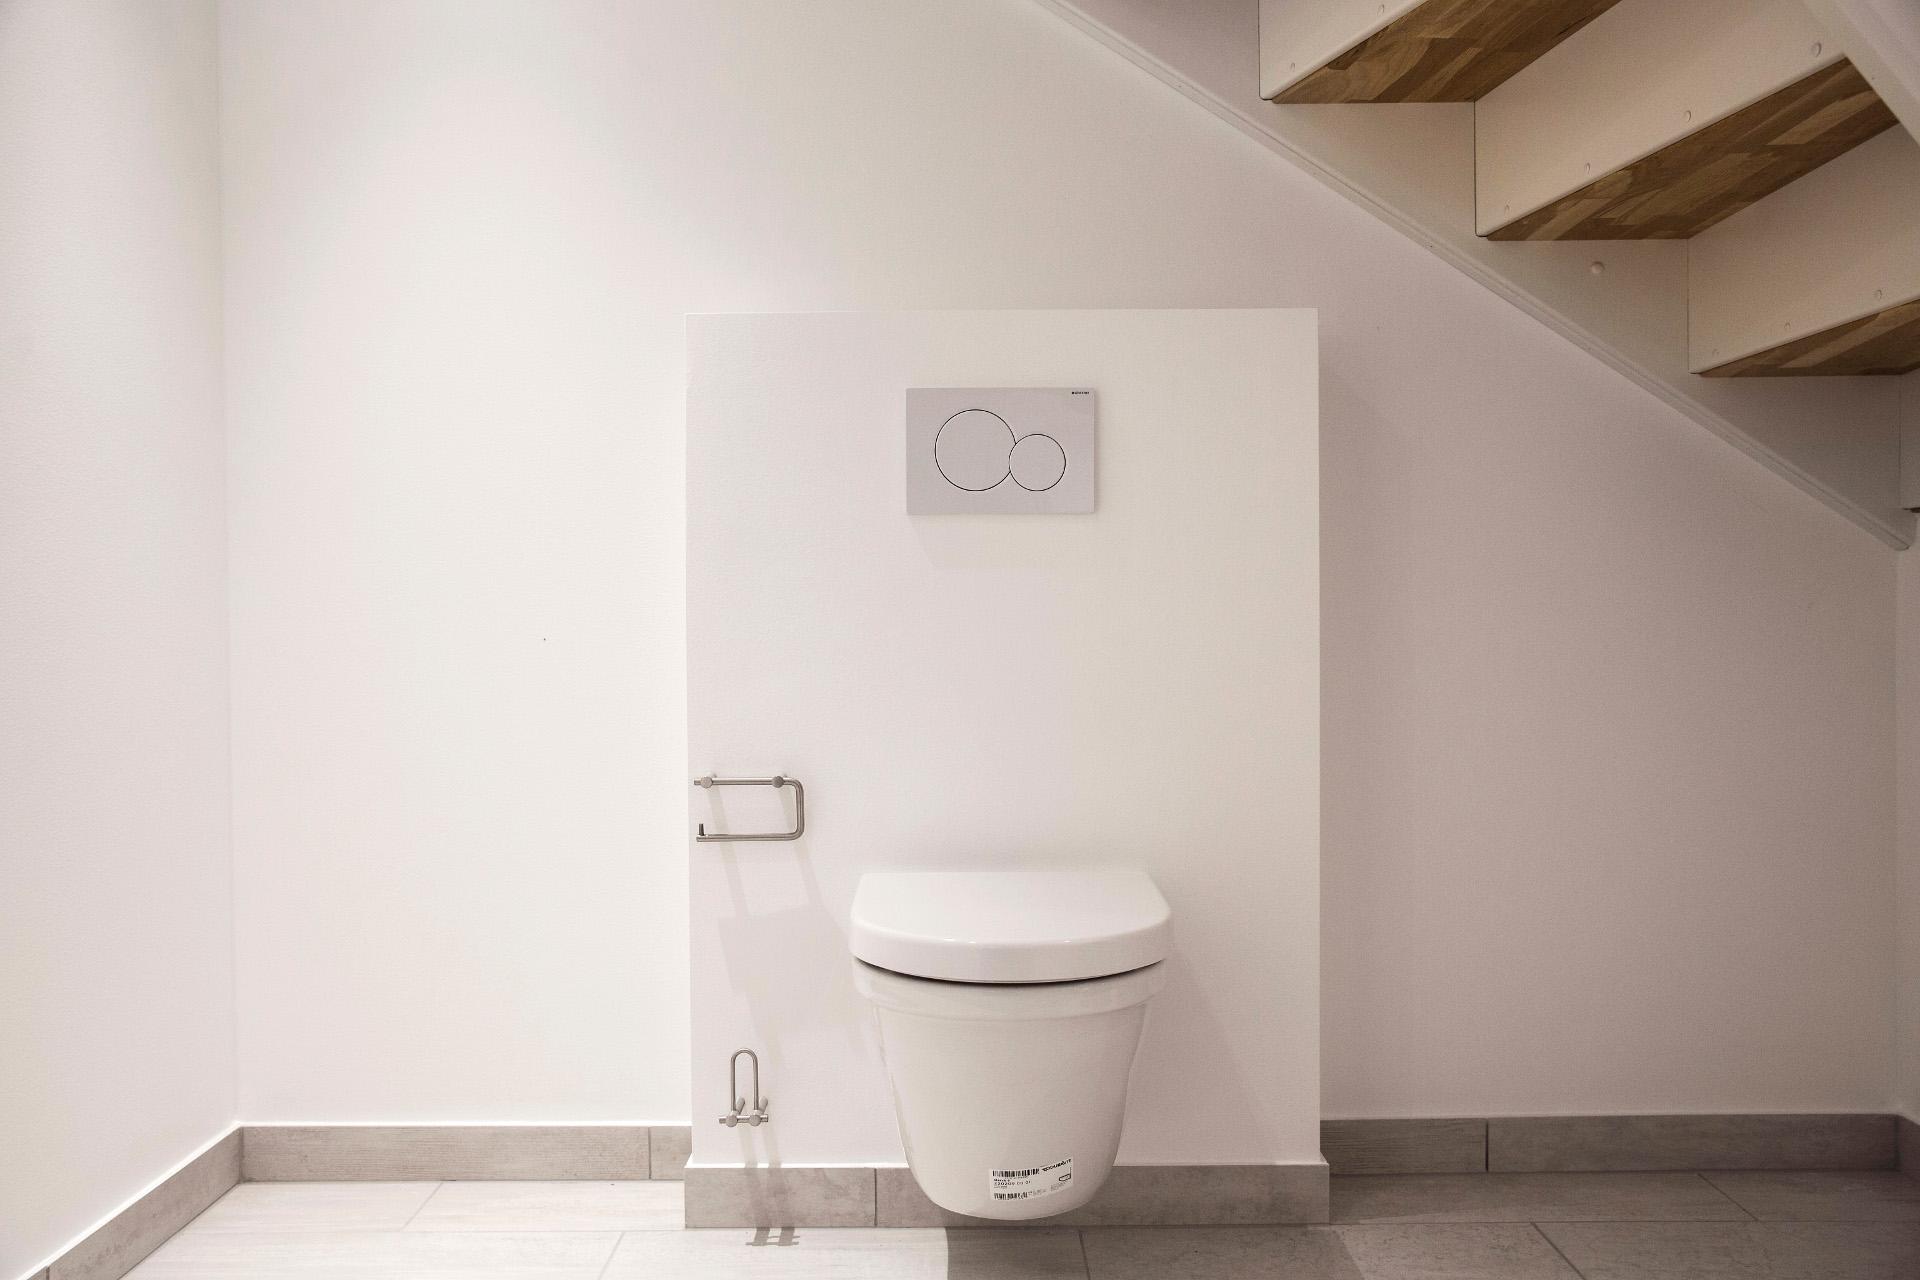 Taghusene toilet